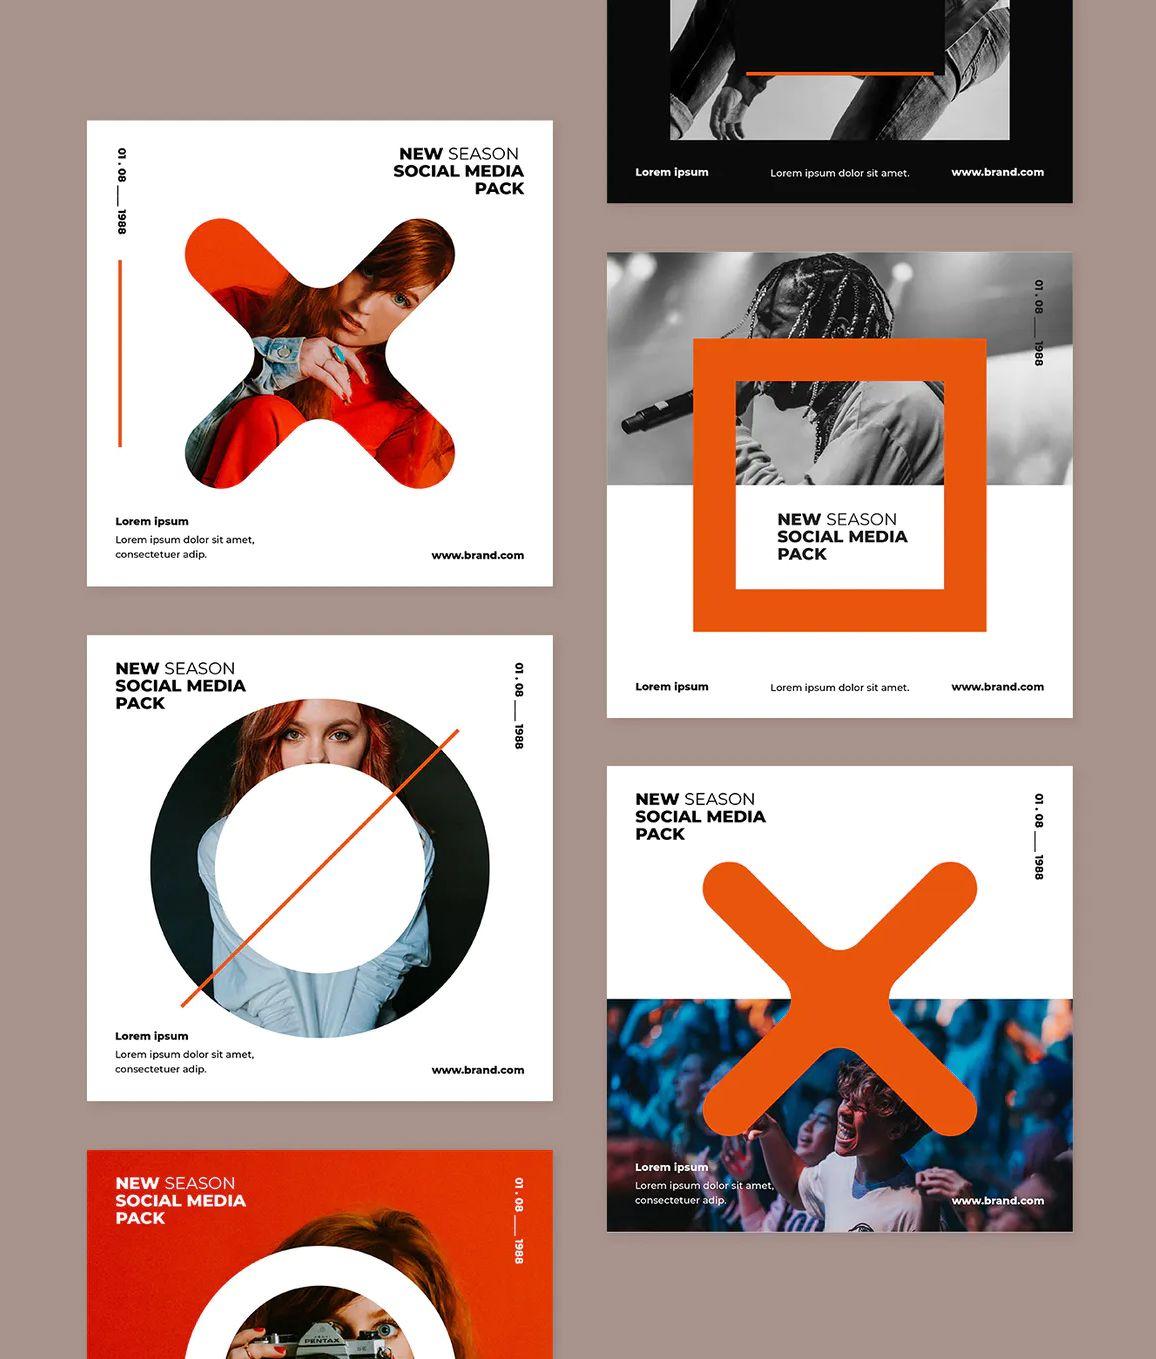 6 Creative Social Media Post Templates Social Media Design Inspiration Social Media Design Social Media Post